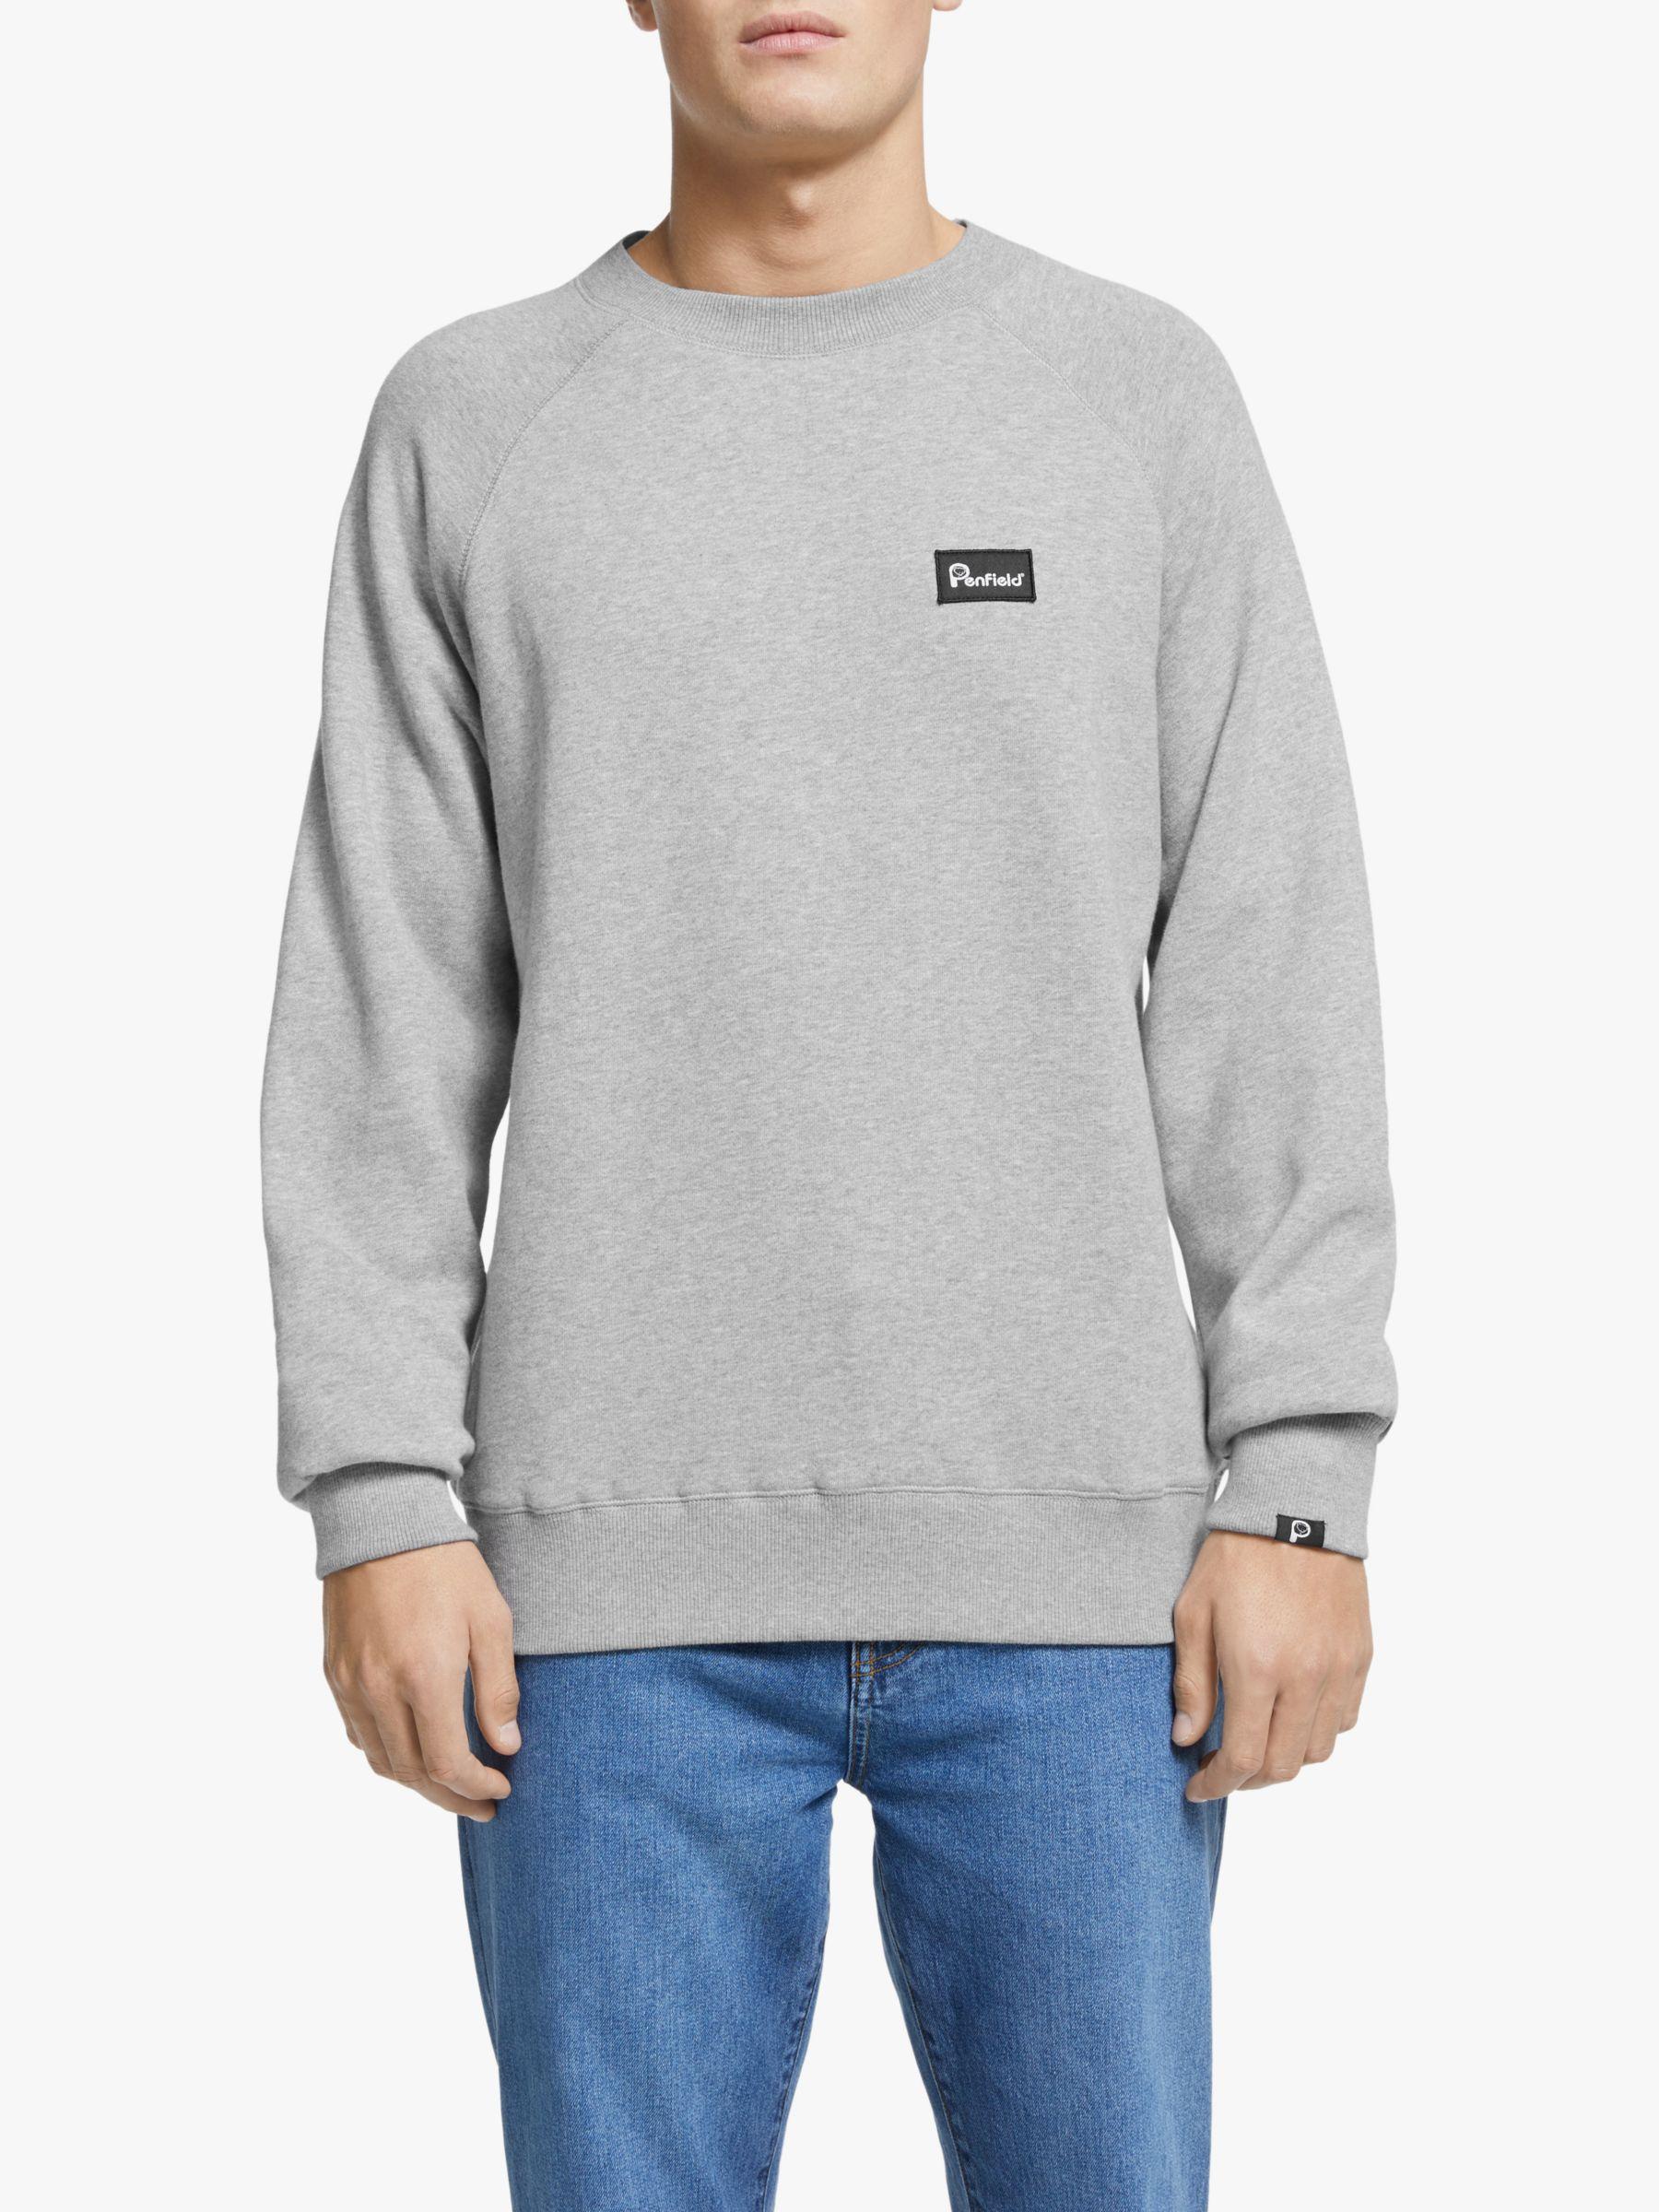 Penfield Penfield Errol Crew Sweatshirt, Grey Marl